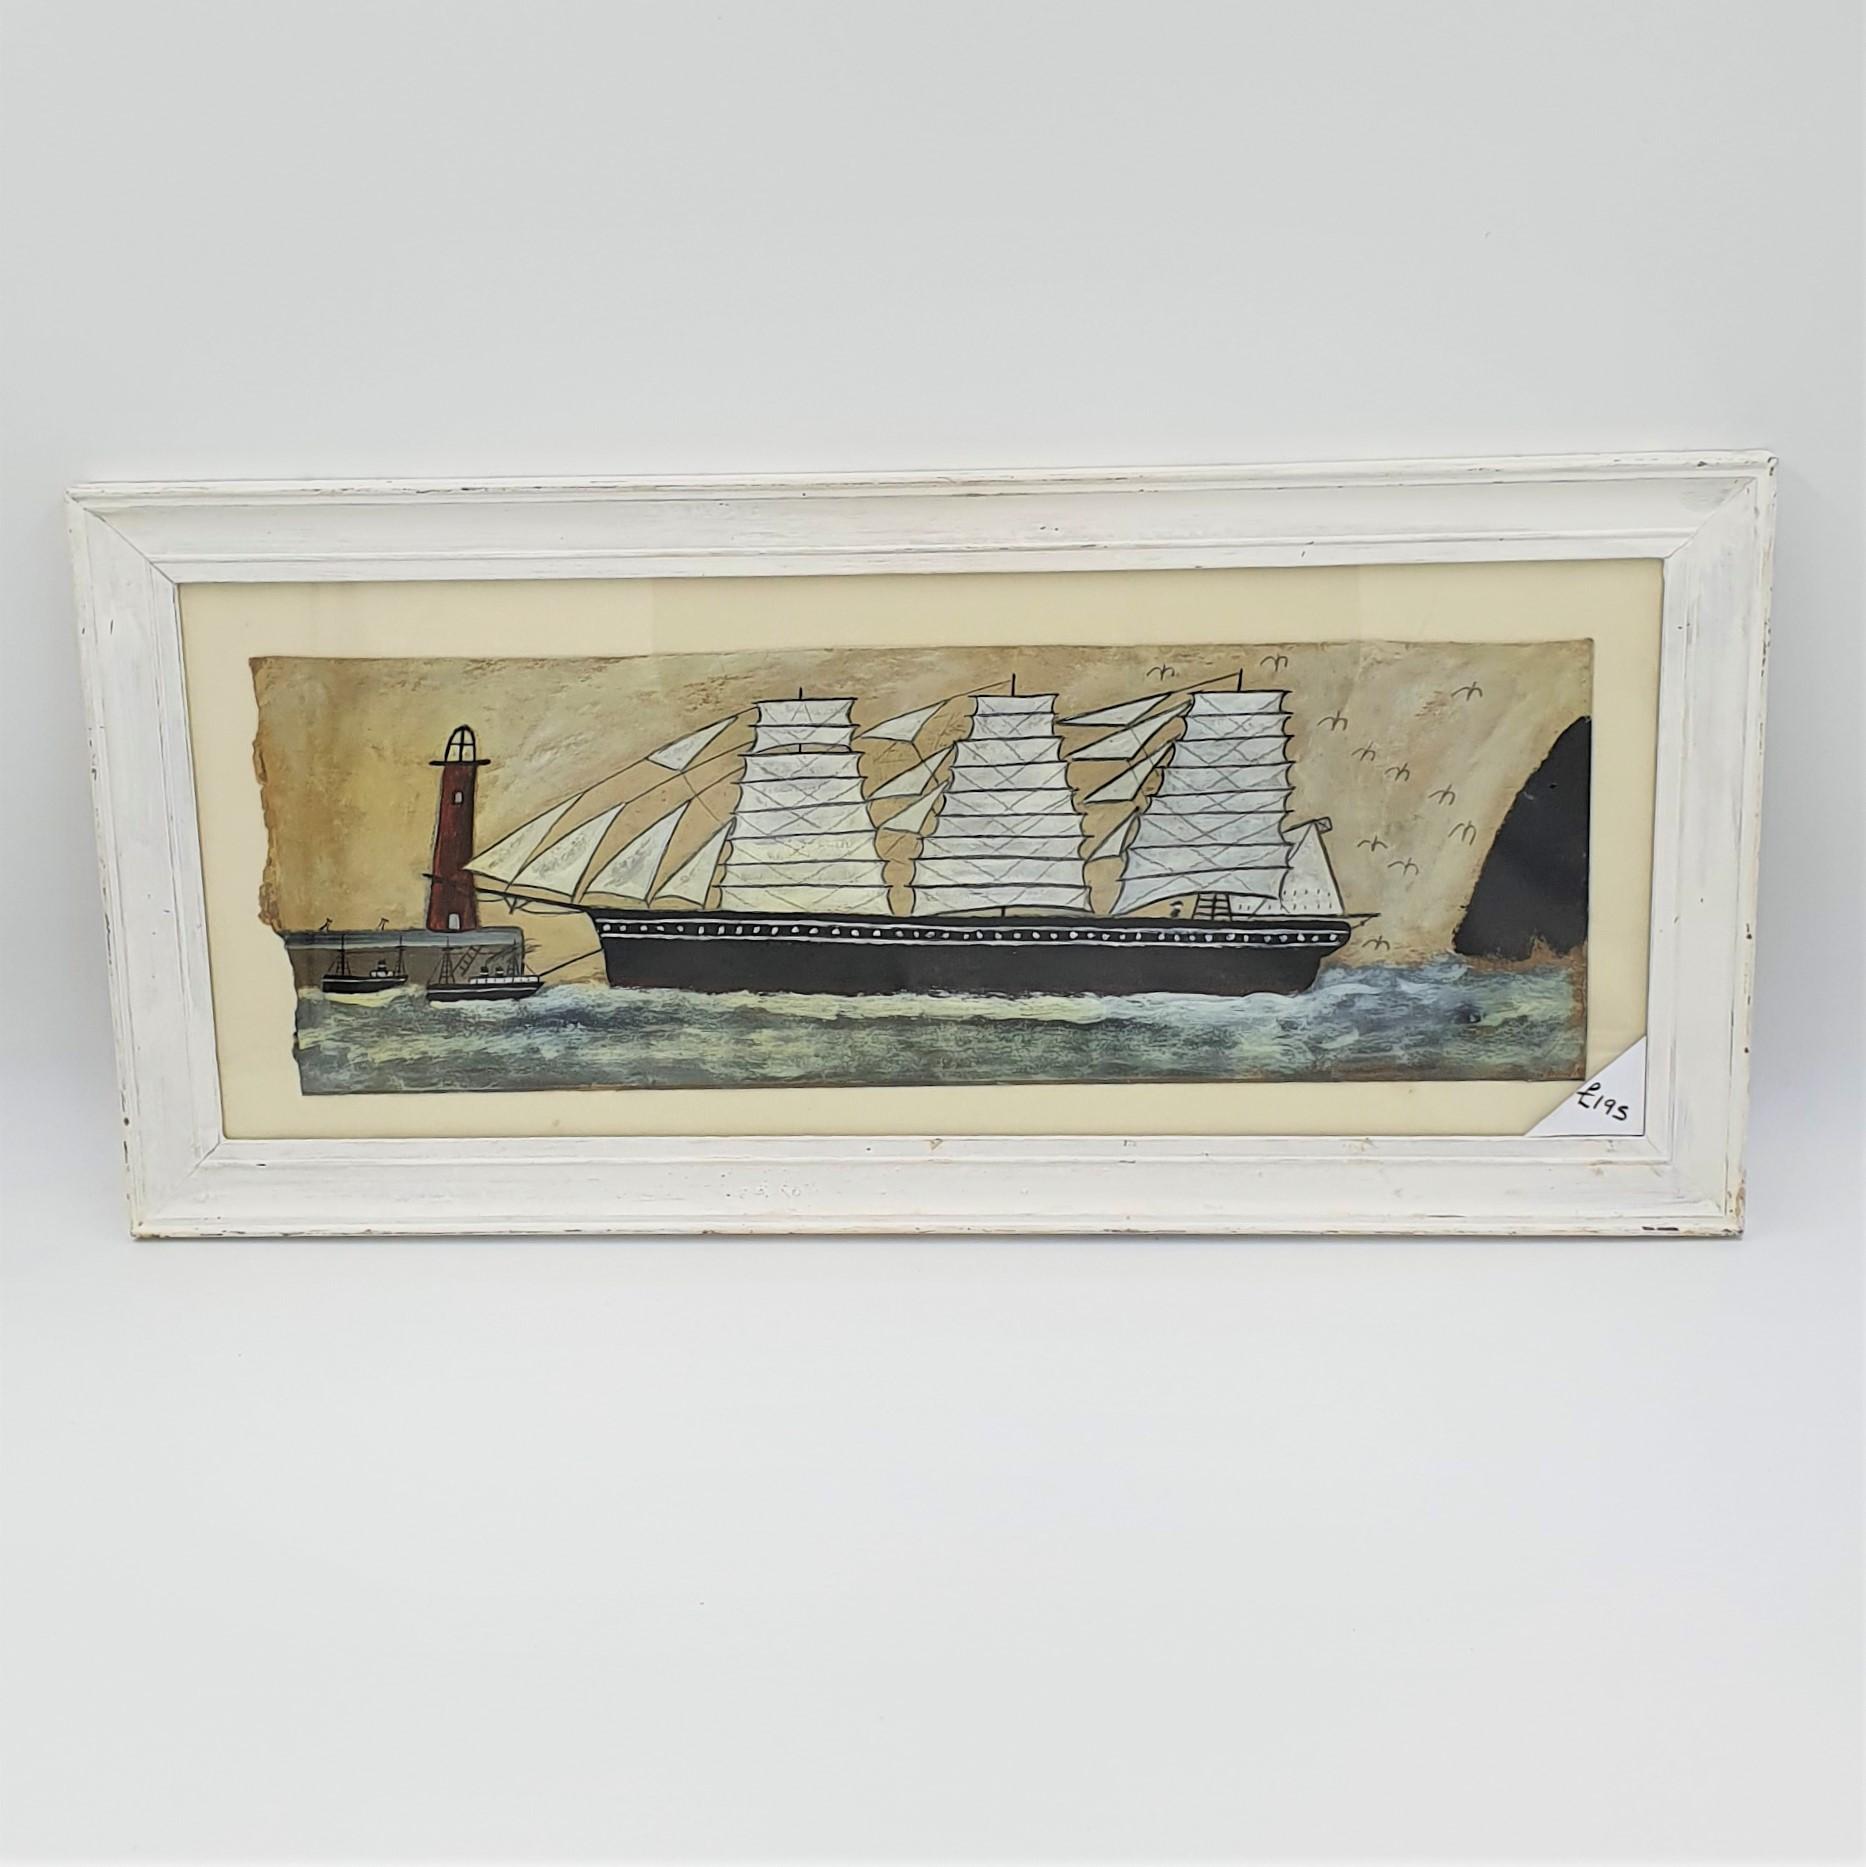 Max Wildman - Full rigged ship entering port